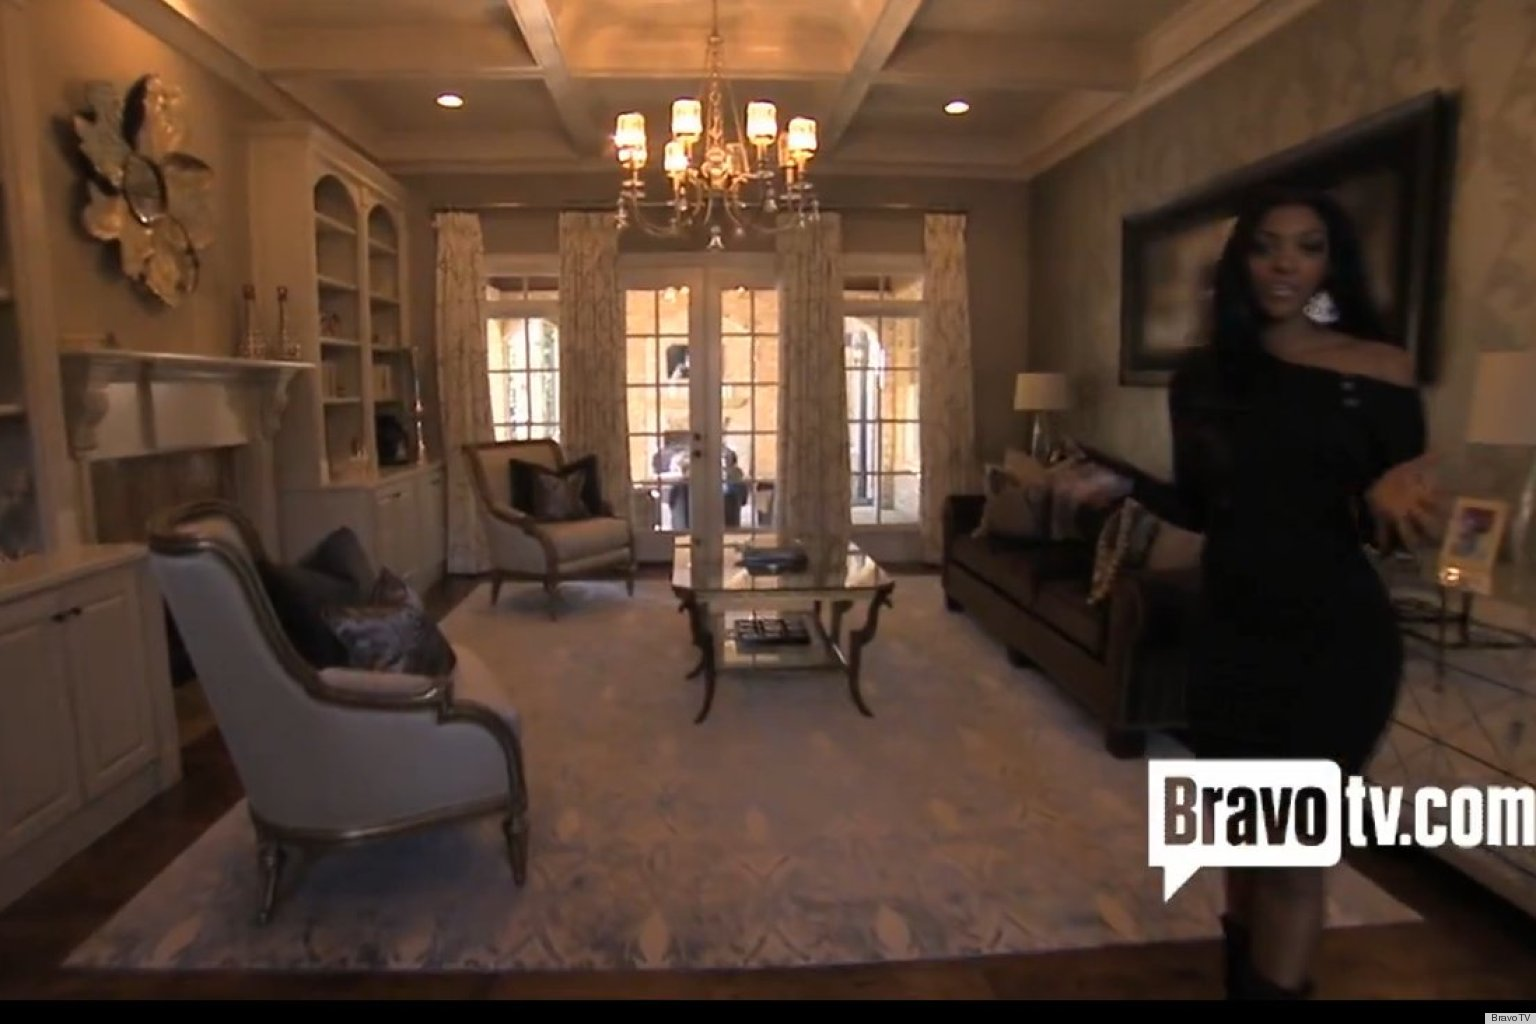 Porsha Williams Kordell Stewart Divorce Reports Have Us